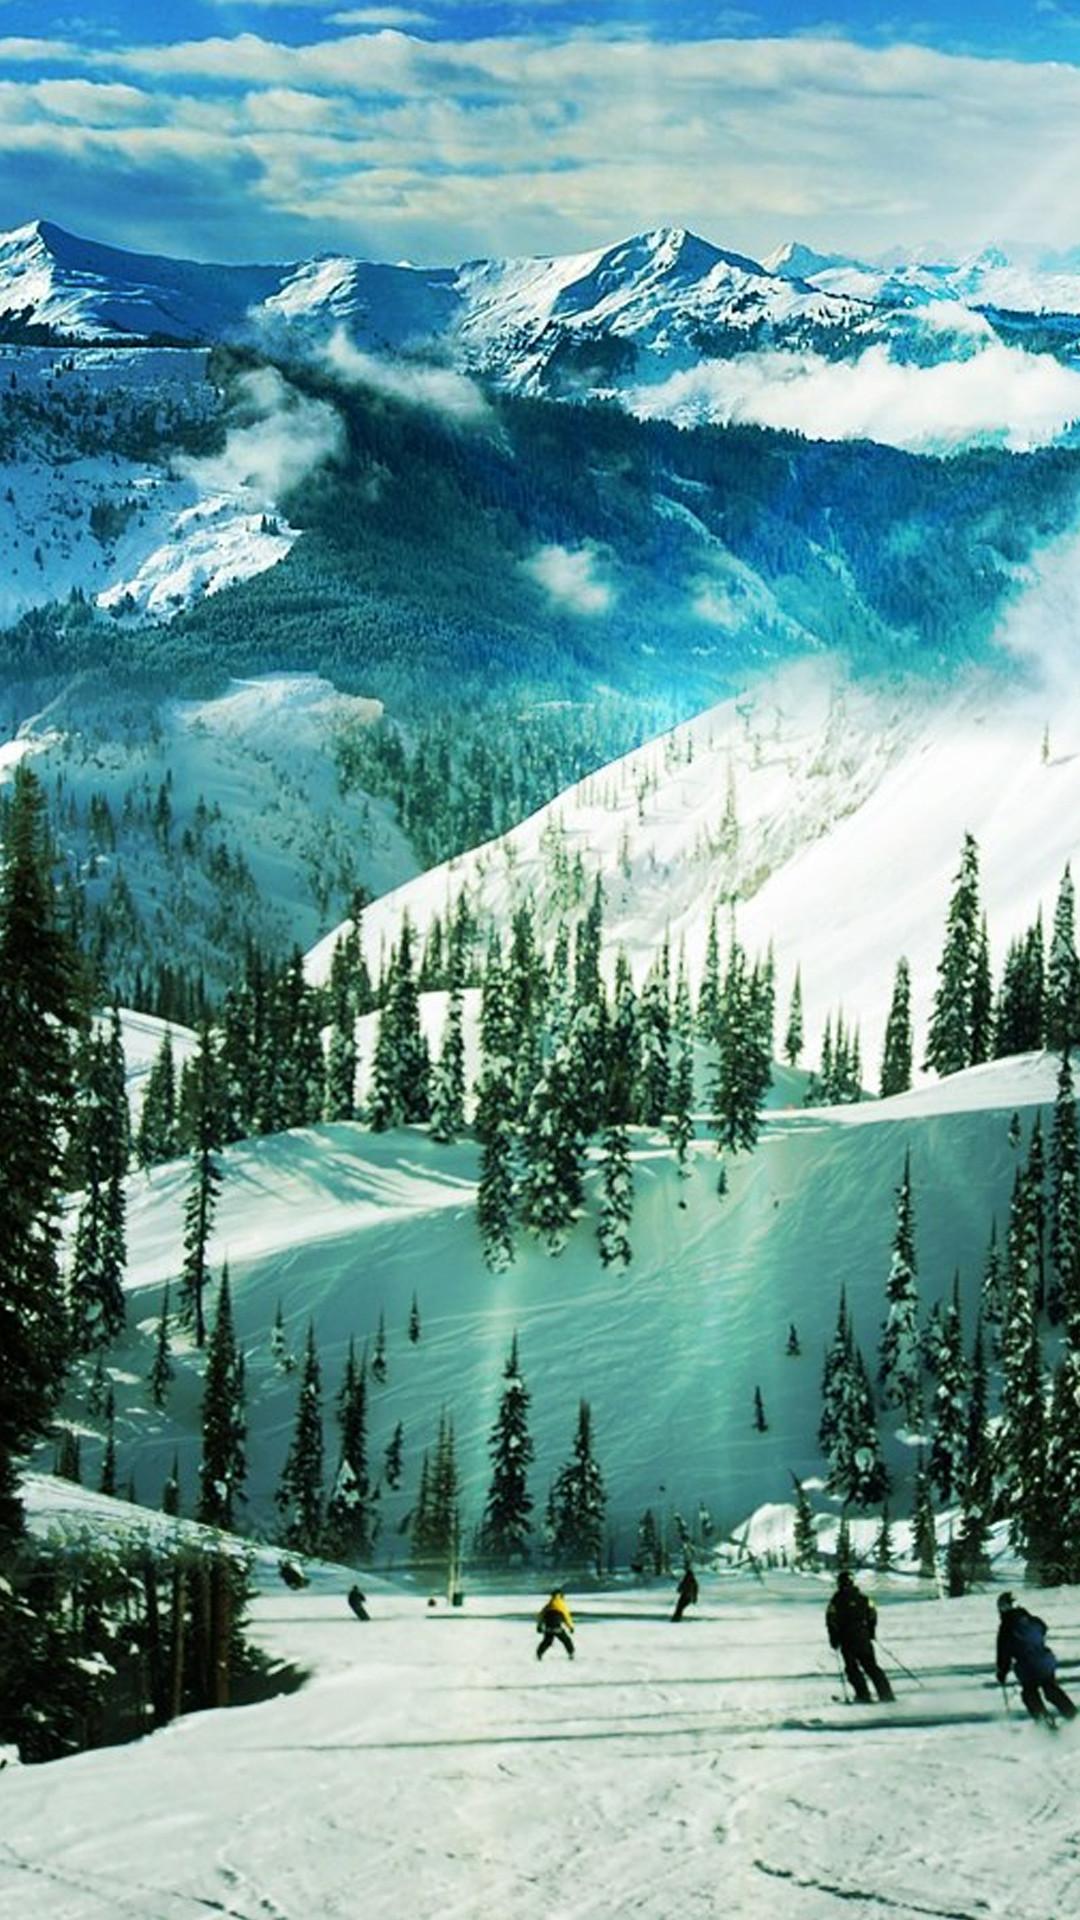 60 BEAUTIFUL NATURE WALLPAPER FREE TO DOWNLOAD